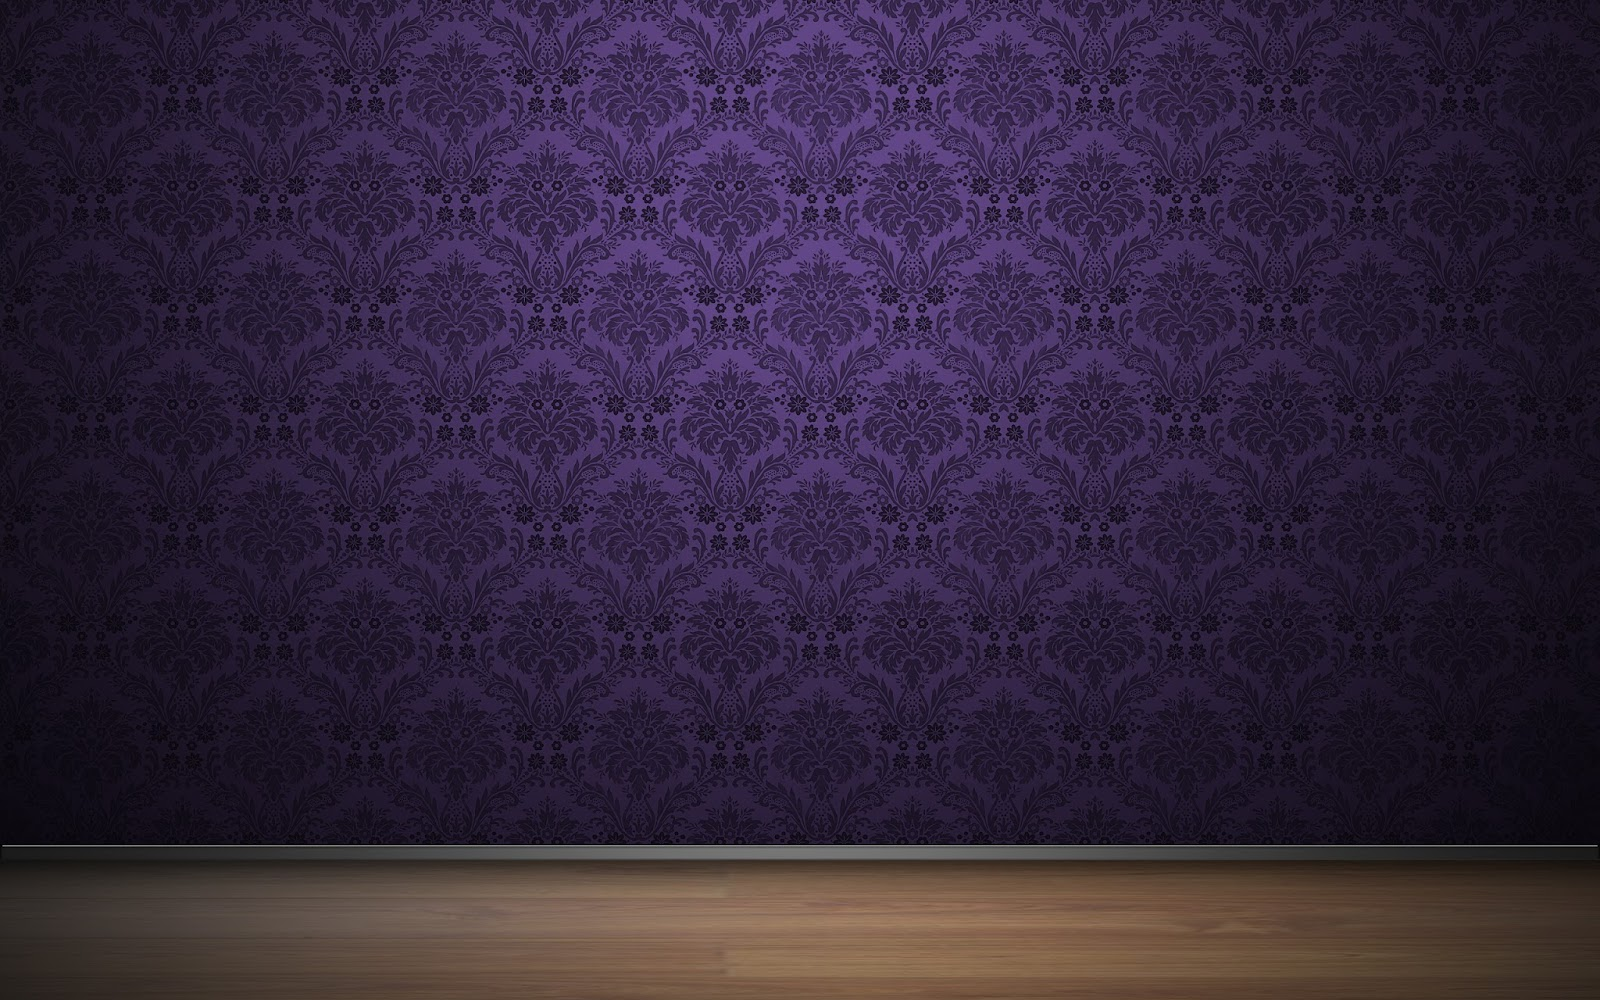 Fondo de Pantalla Abstracto Textura morada en pared Imagenes 1600x1000